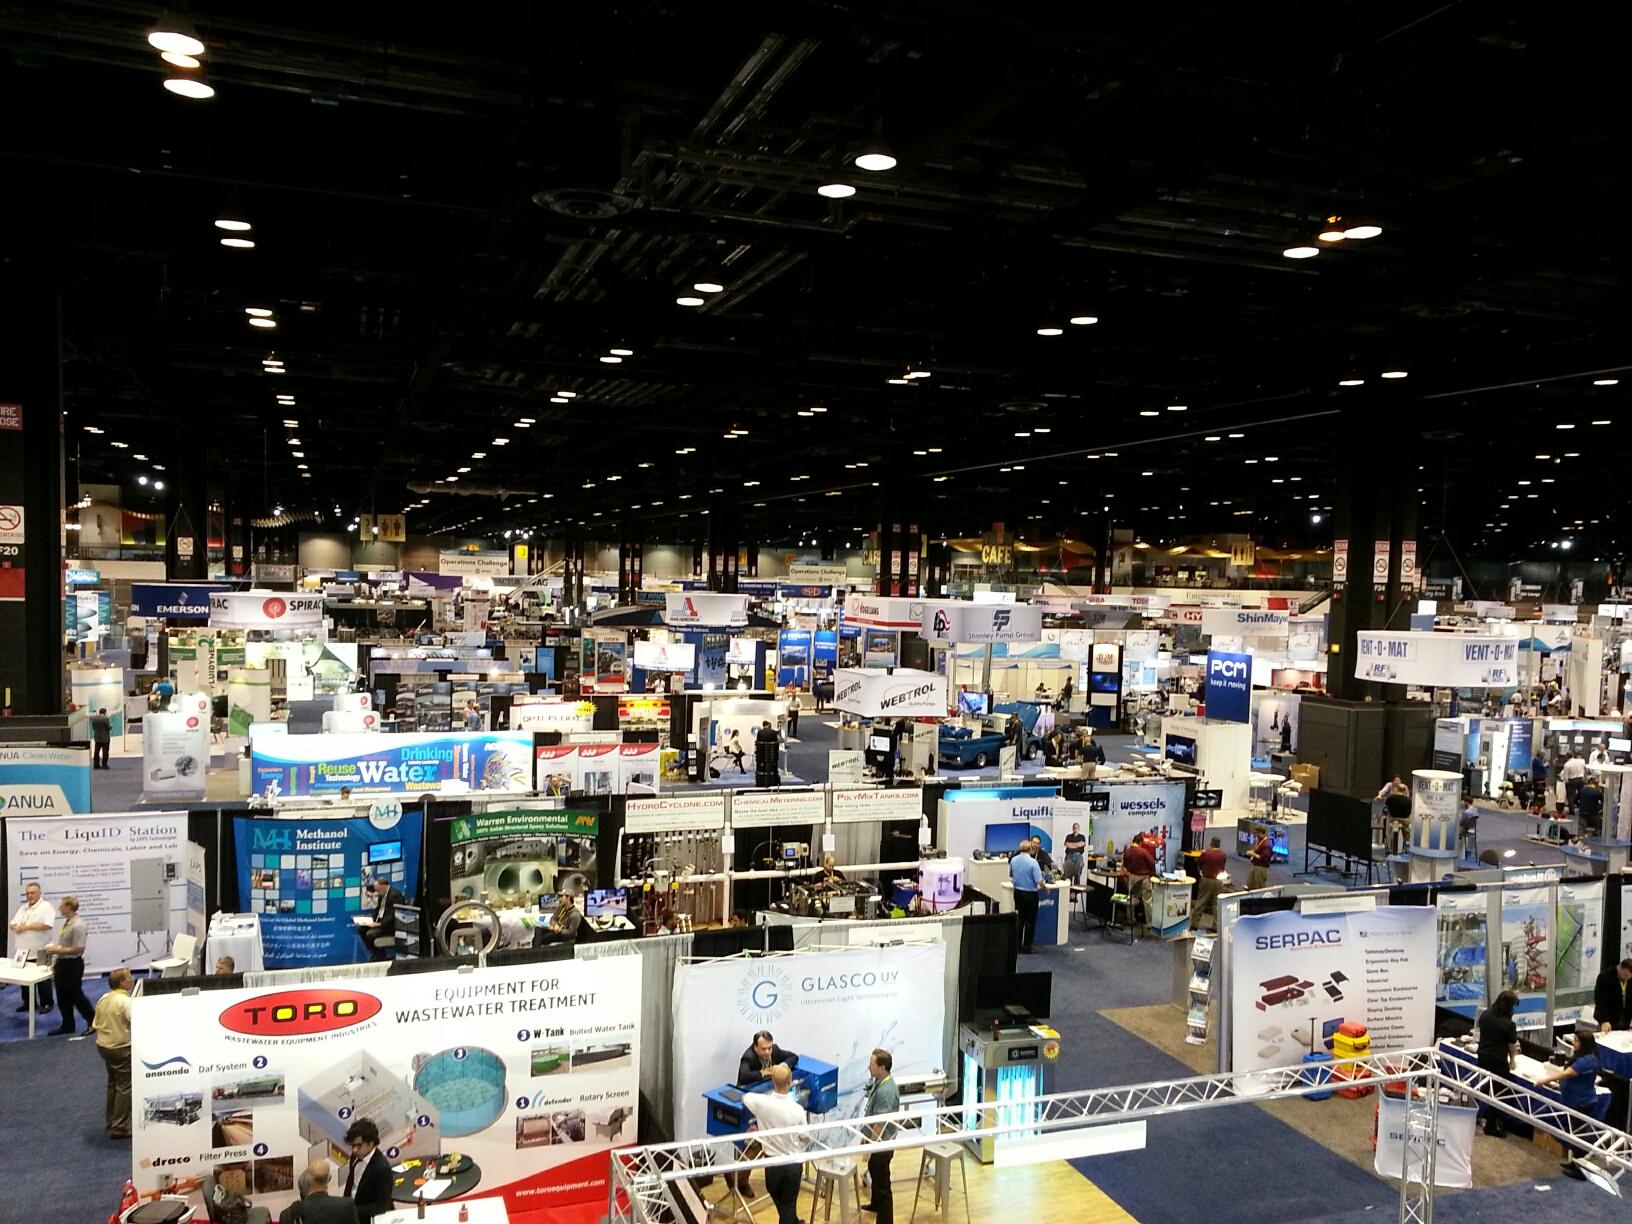 Part of the tradeshow floor